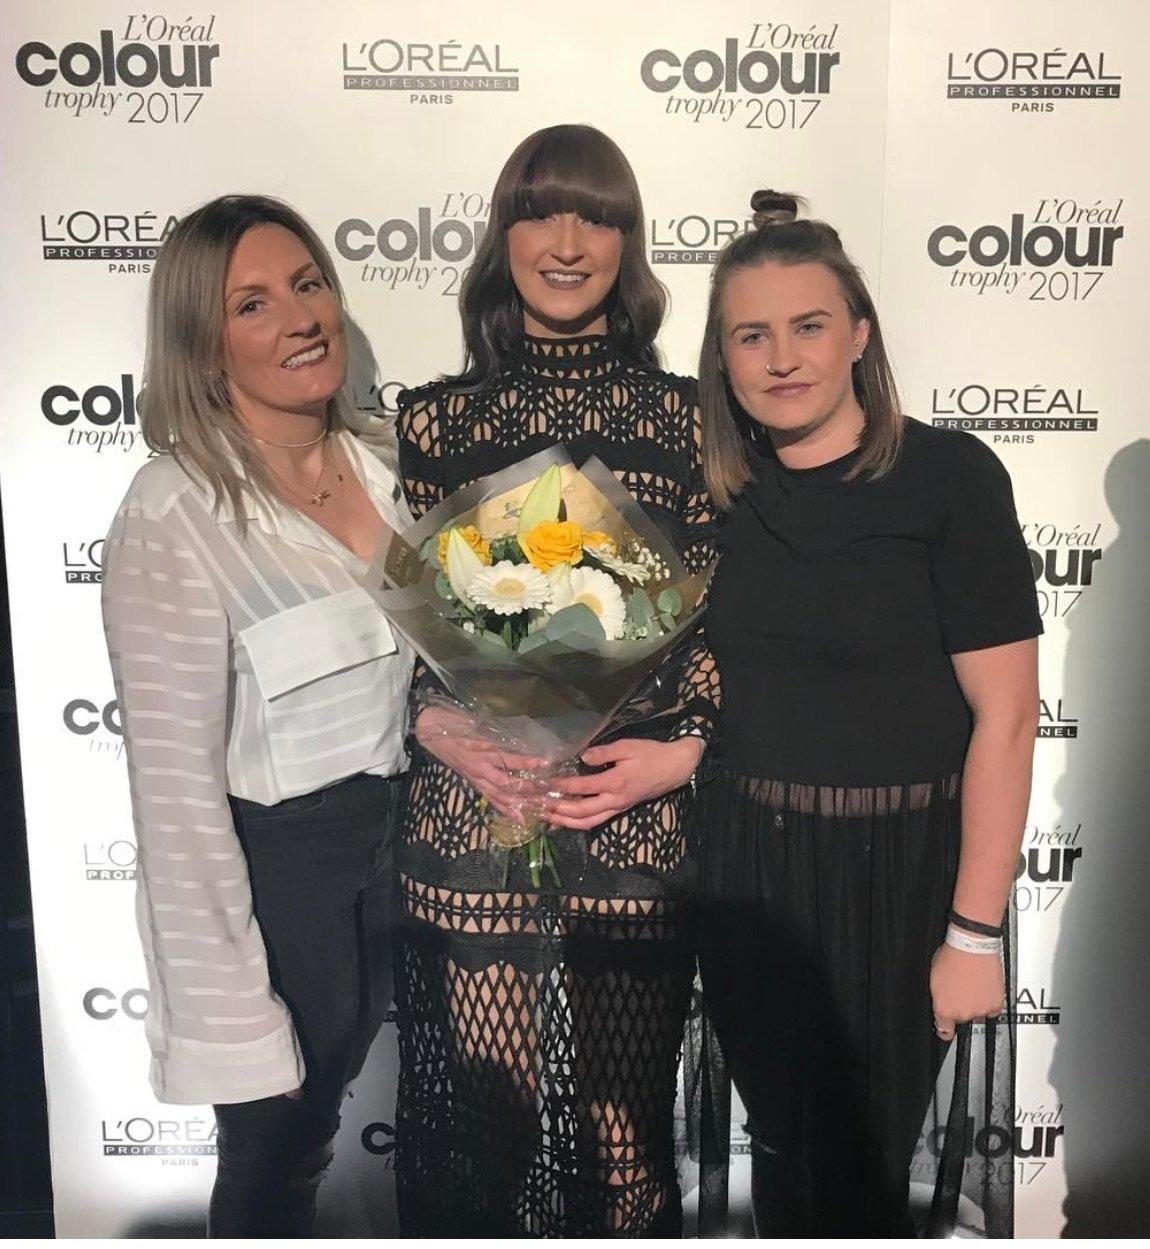 Zappas excel in the L'Oréal Colour Trophy Awards